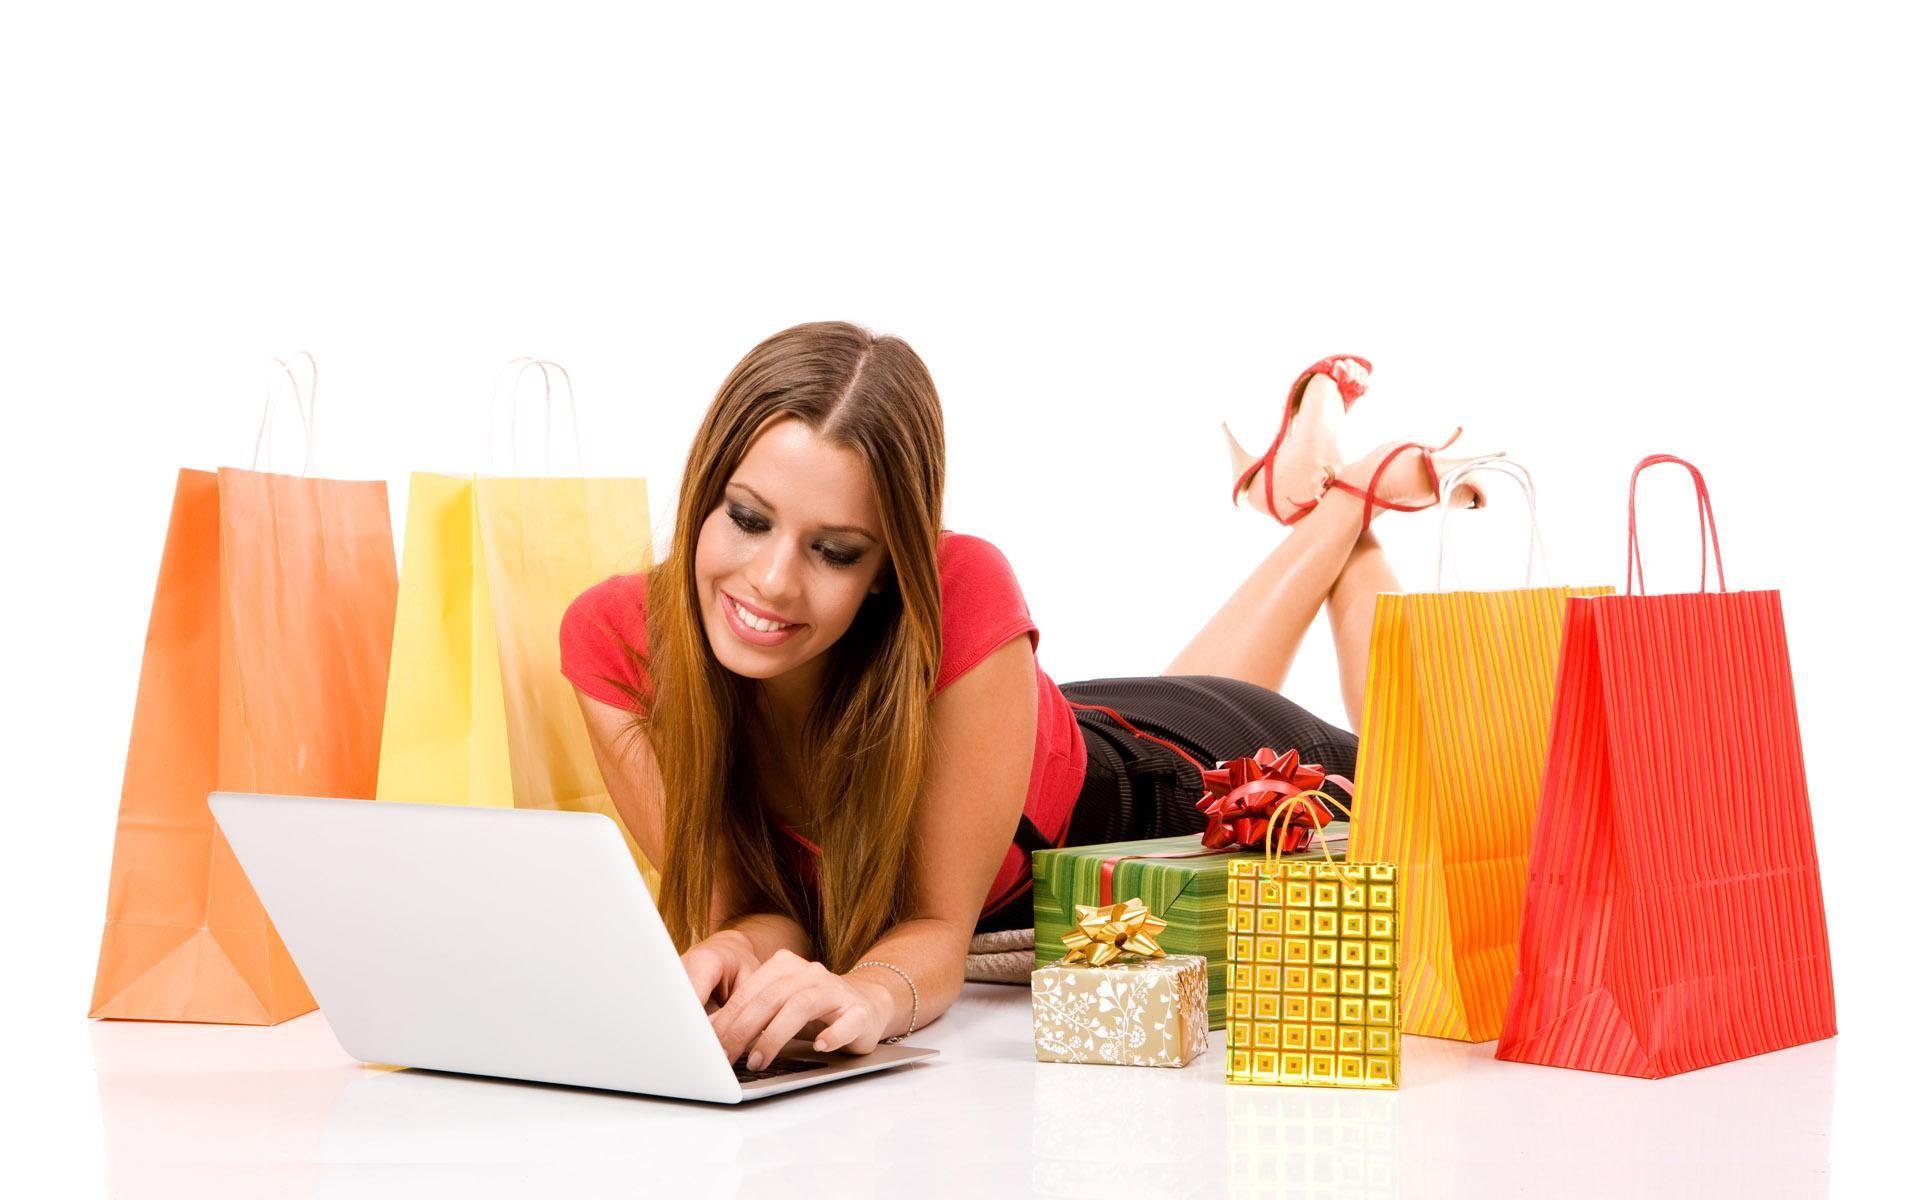 Asegura tus compras de internet gracias a Inspectalia